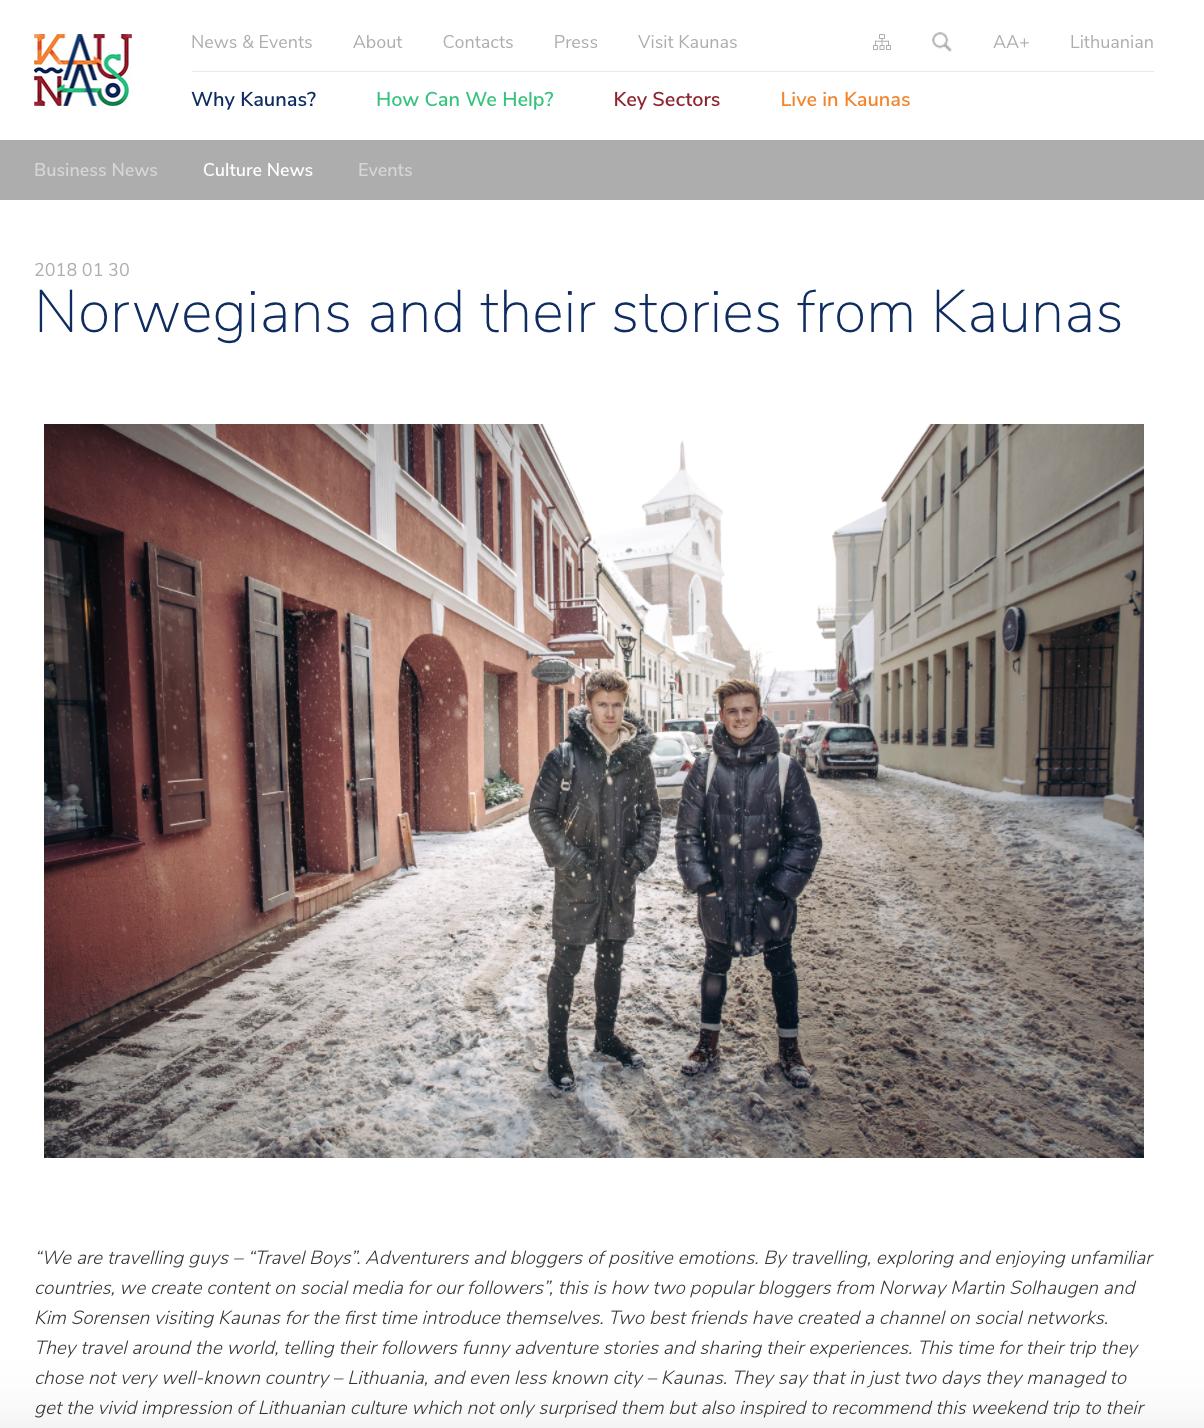 http://kaunasin.lt/norwegians-stories-kaunas/